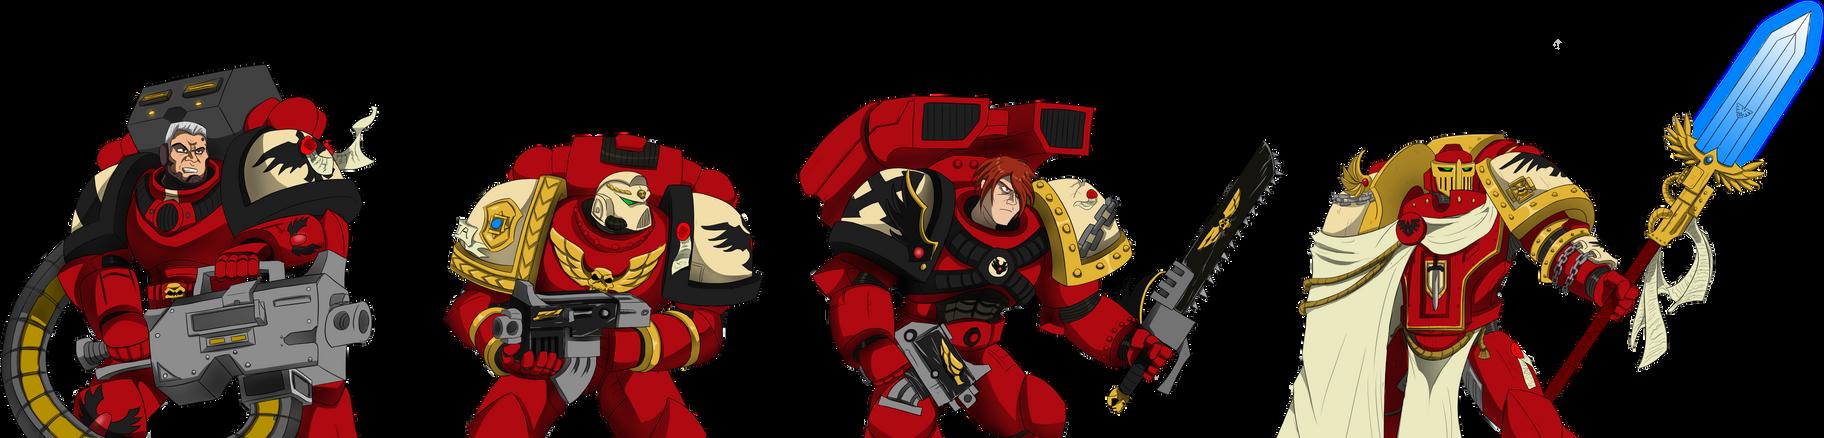 Blood Ravens heroes by Littlecutter